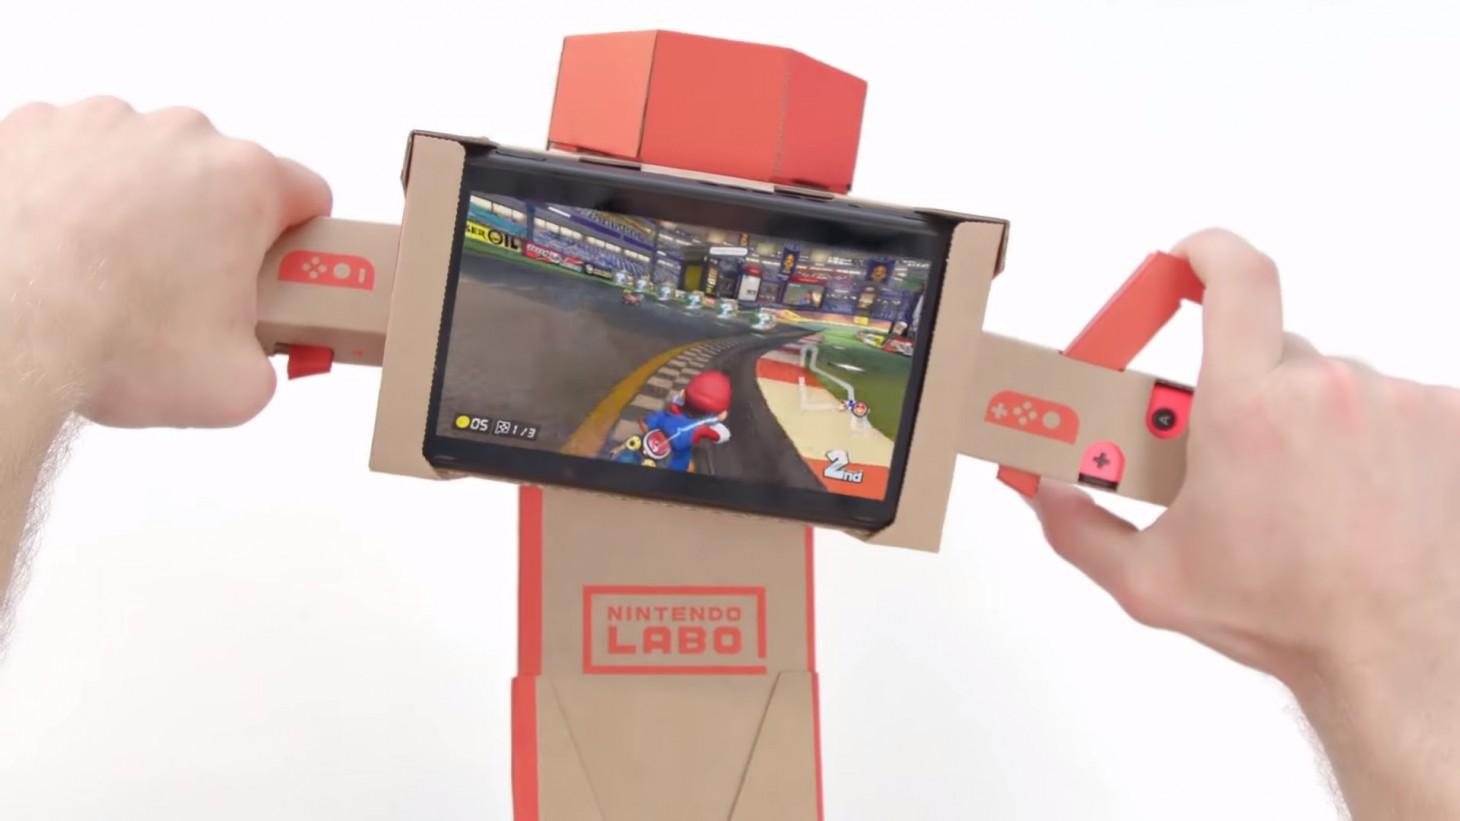 Mario Kart 8 With Nintendo Labo